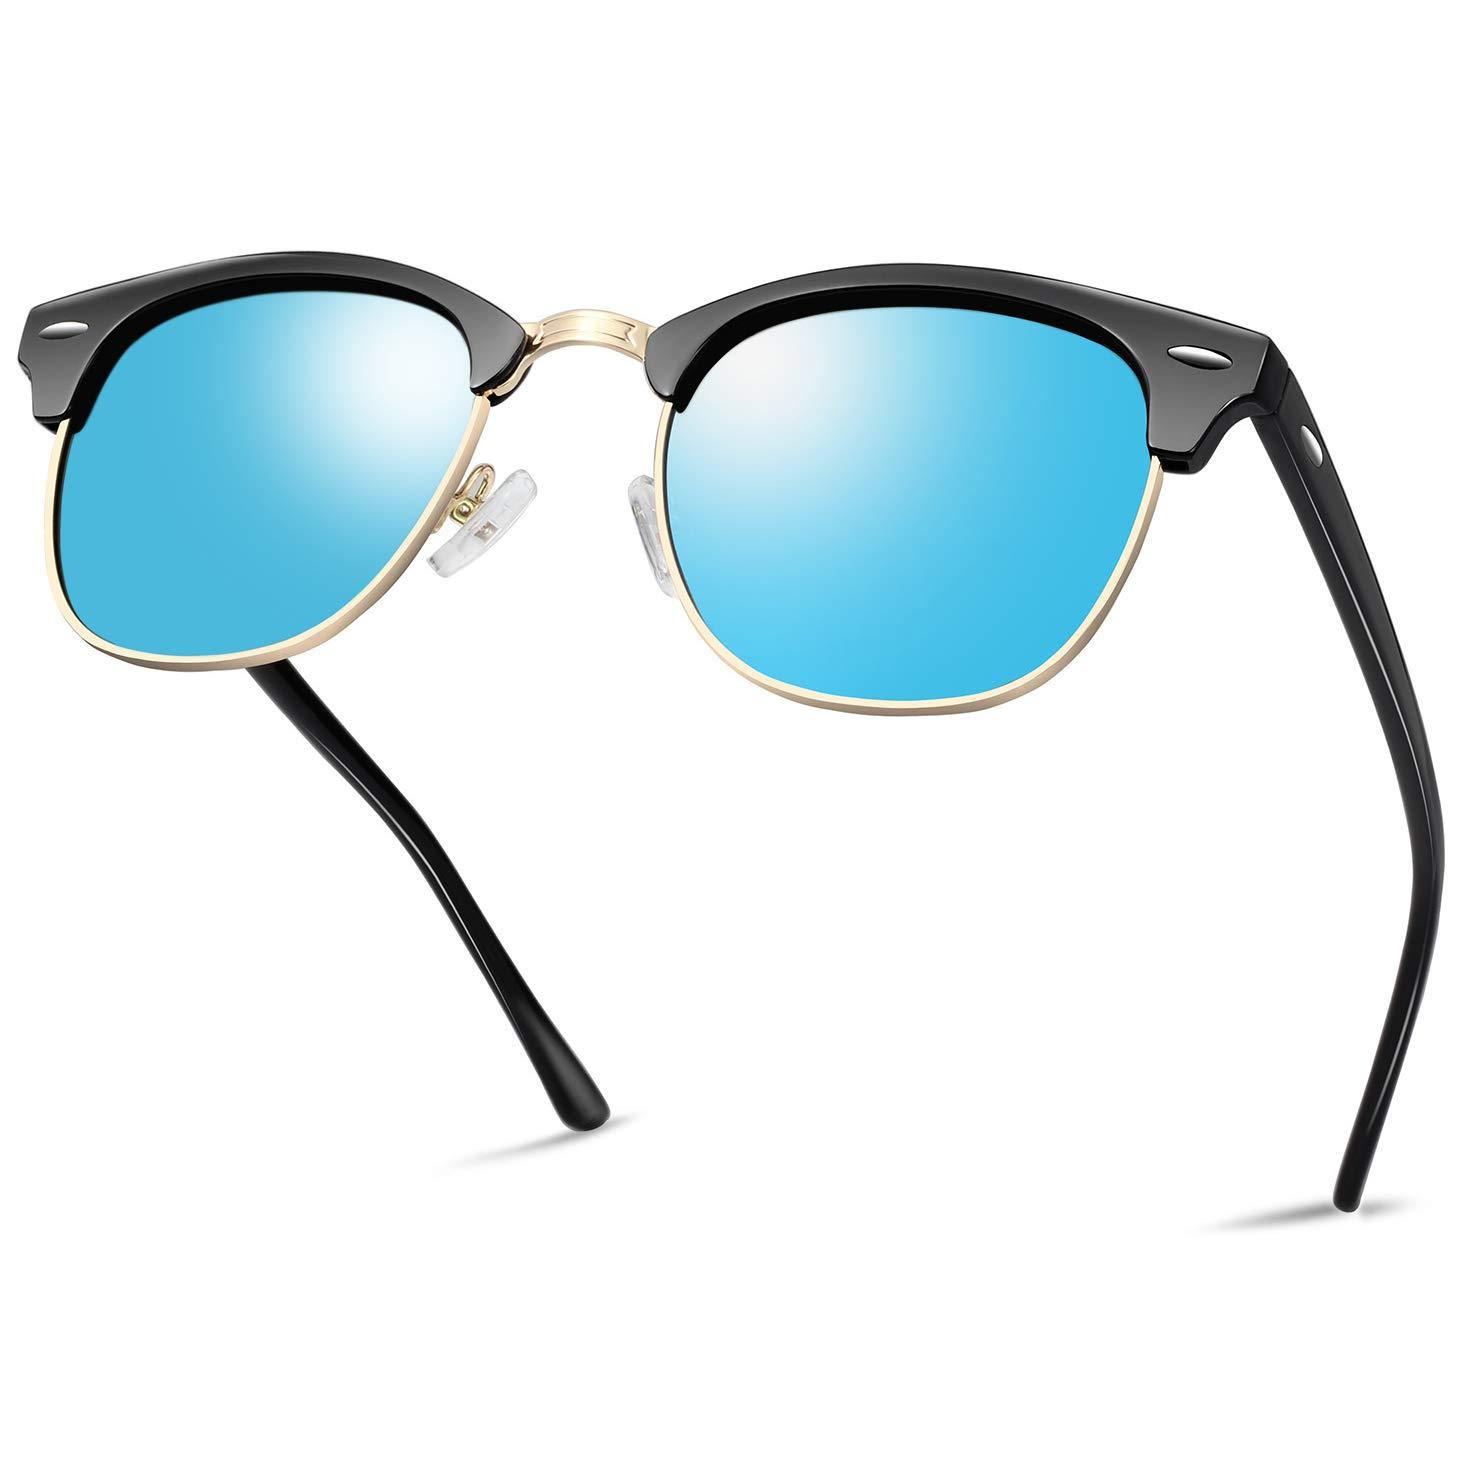 Semi Rimless Polarized Sunglasses for Women Men, Unisex Sunglasses with Half Frame - Blue Mirrored Lens by KANASTAL